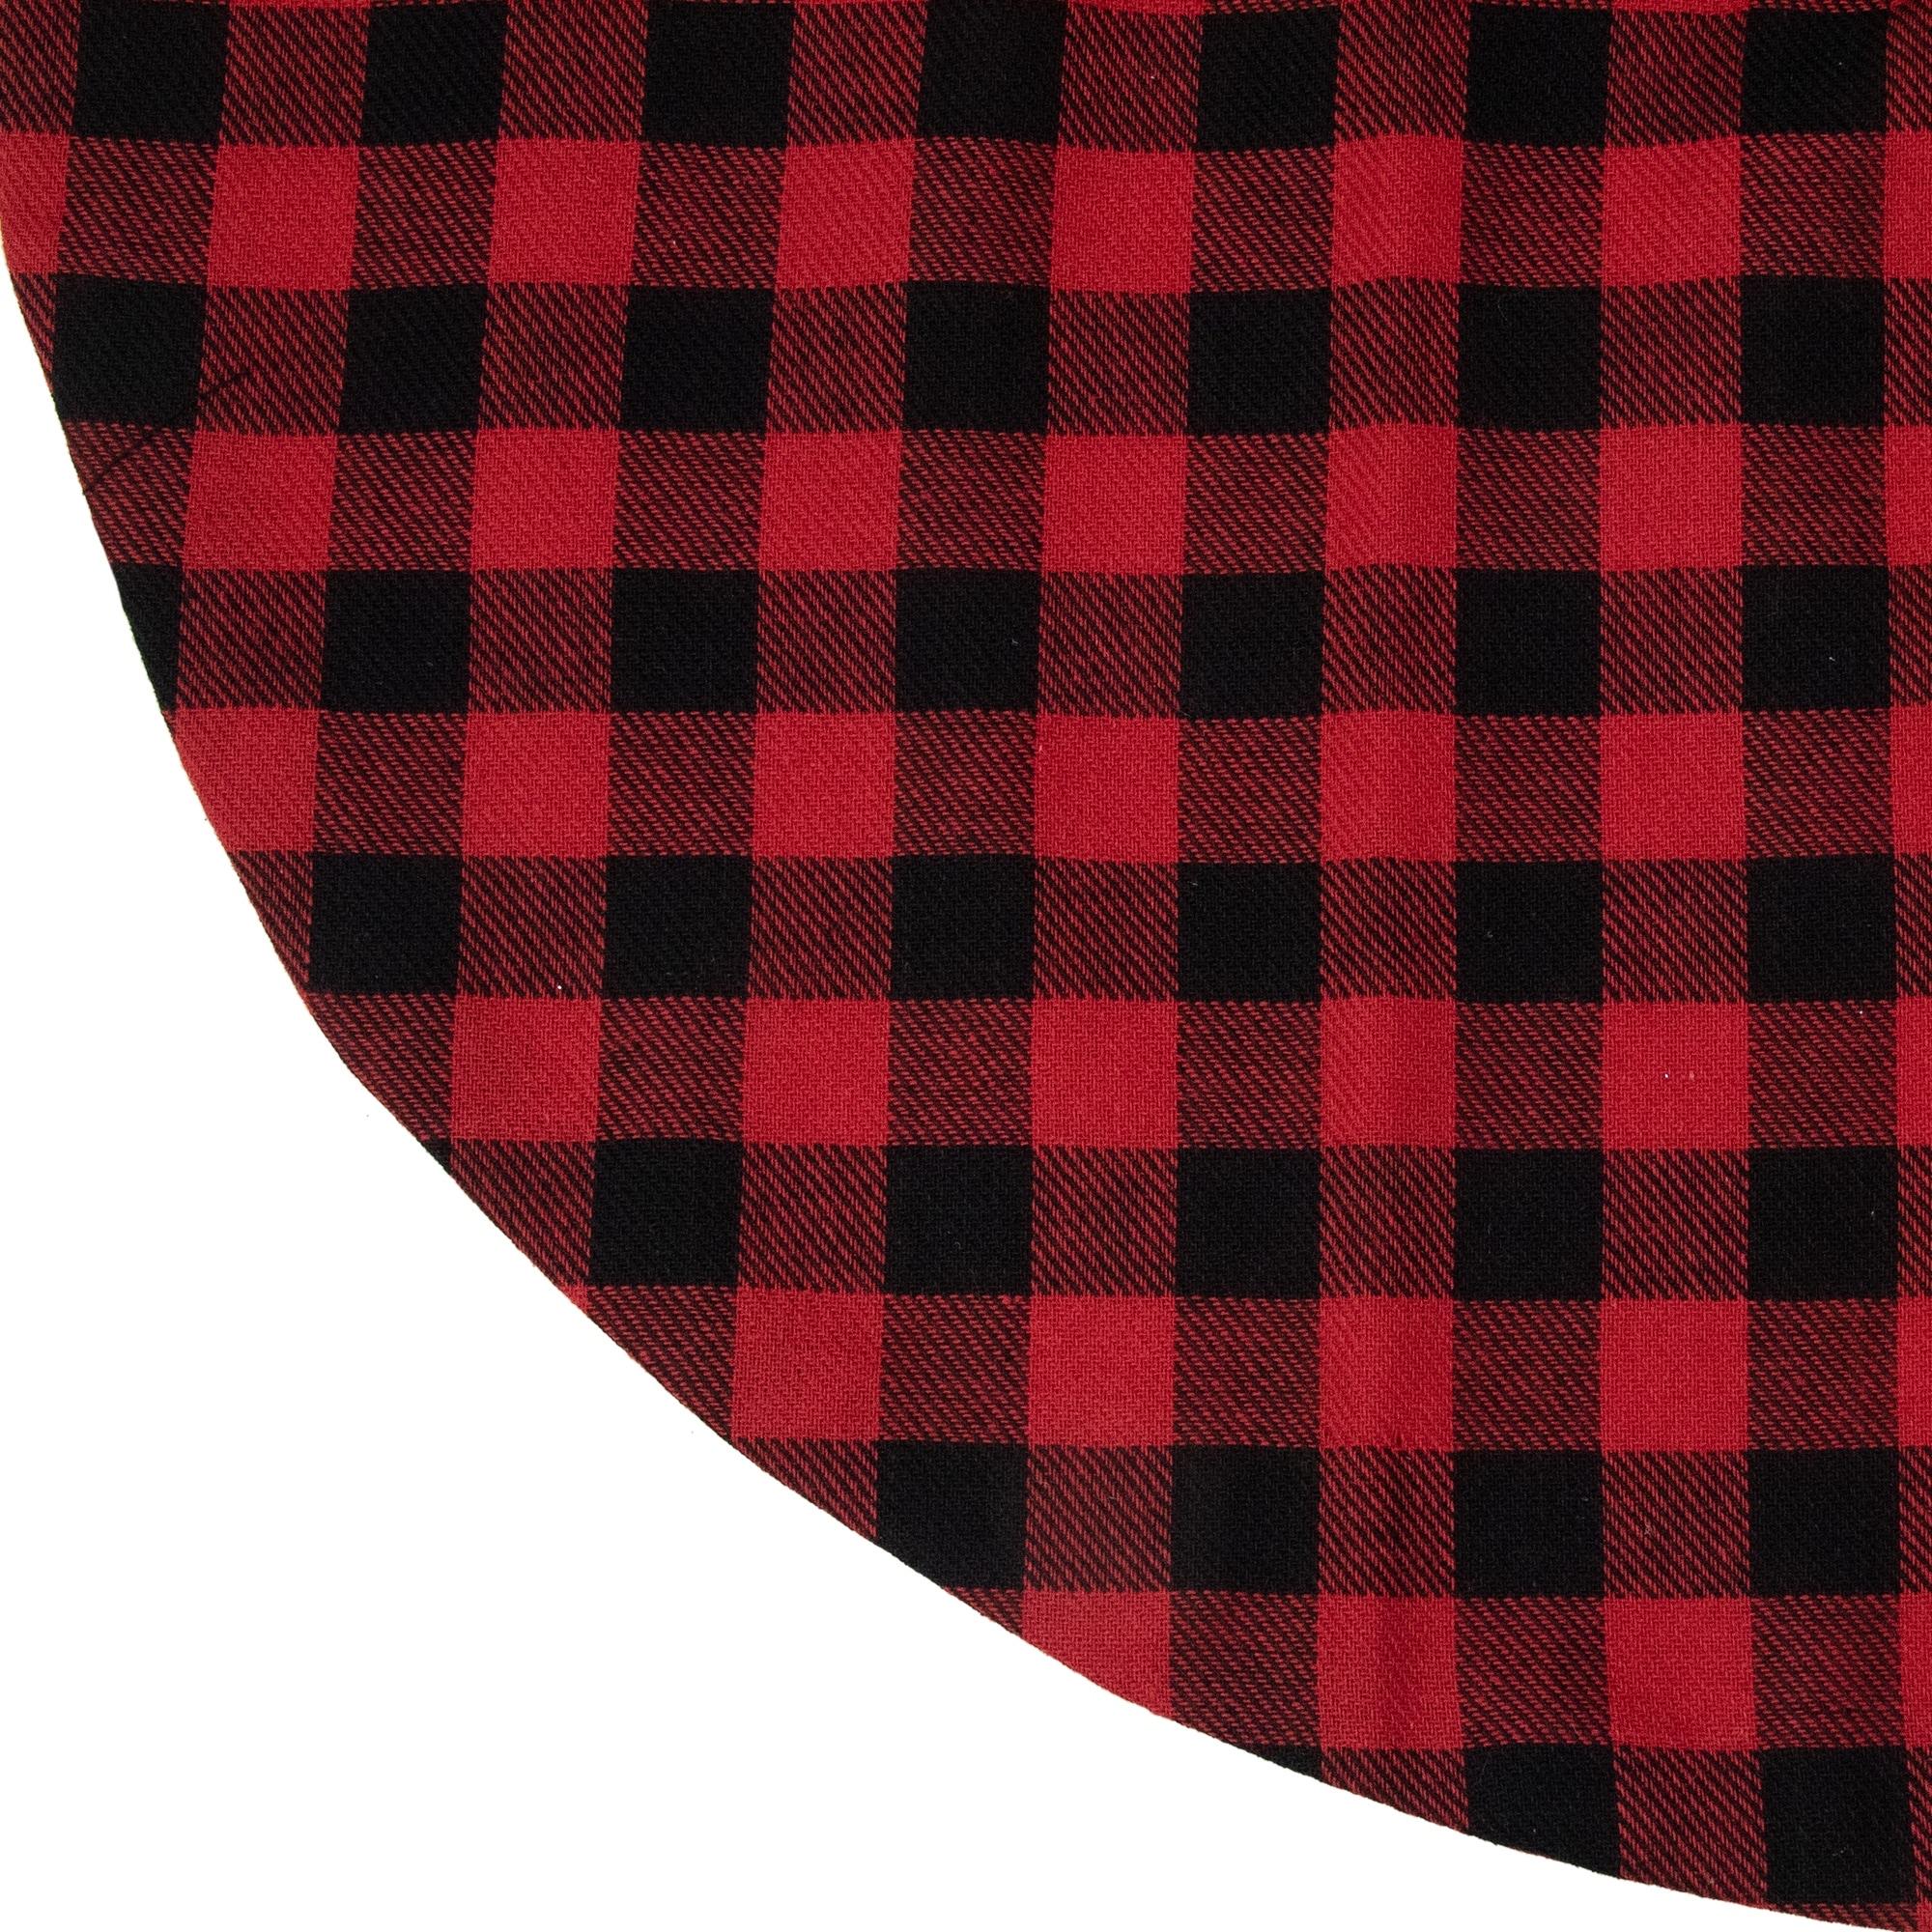 20 Red And Black Buffalo Plaid Mini Christmas Tree Skirt Overstock 30272516